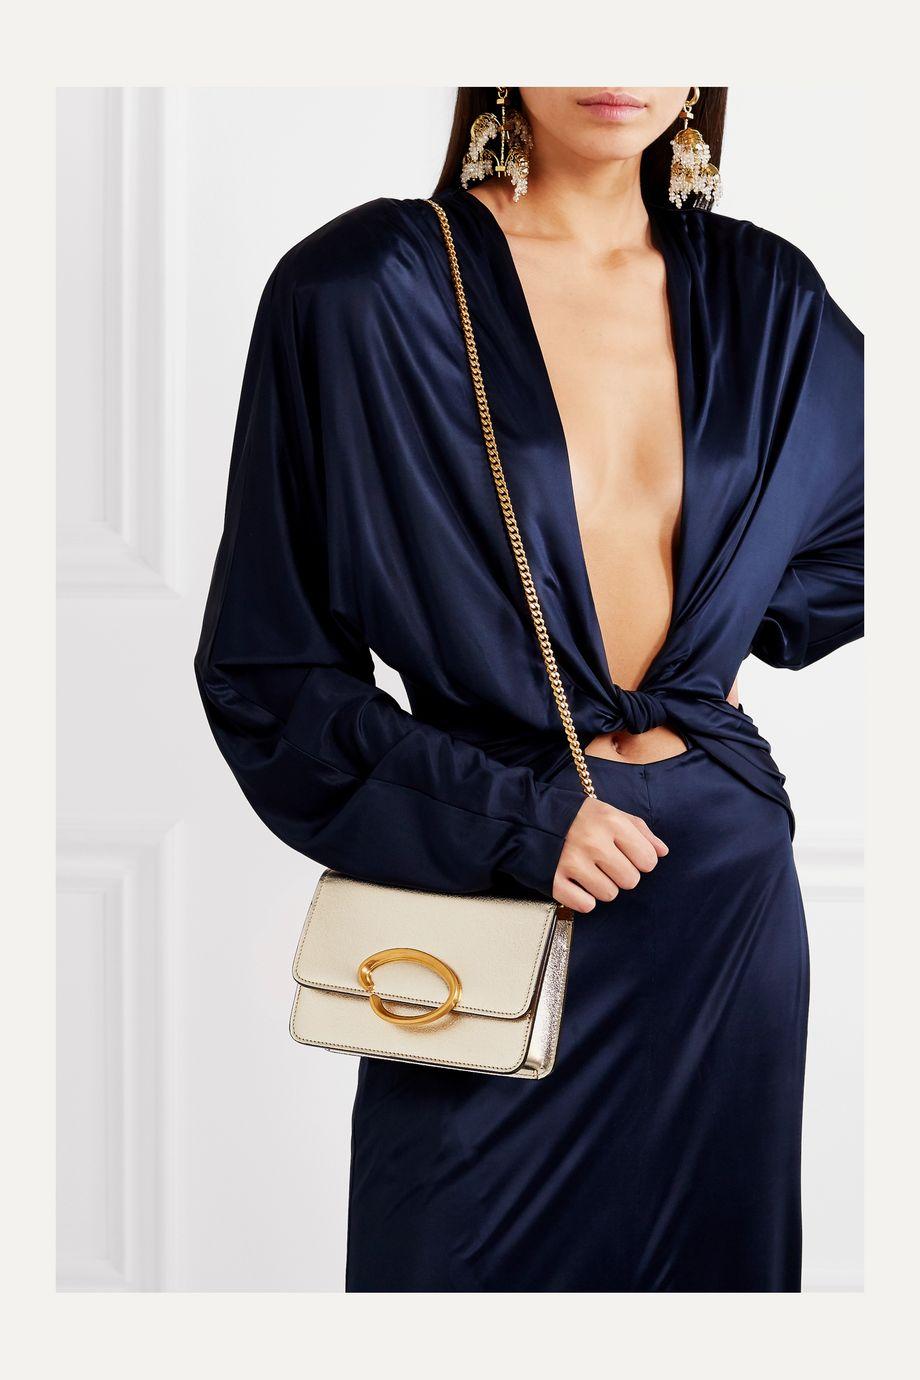 Oscar de la Renta O Chain metallic textured-leather shoulder bag